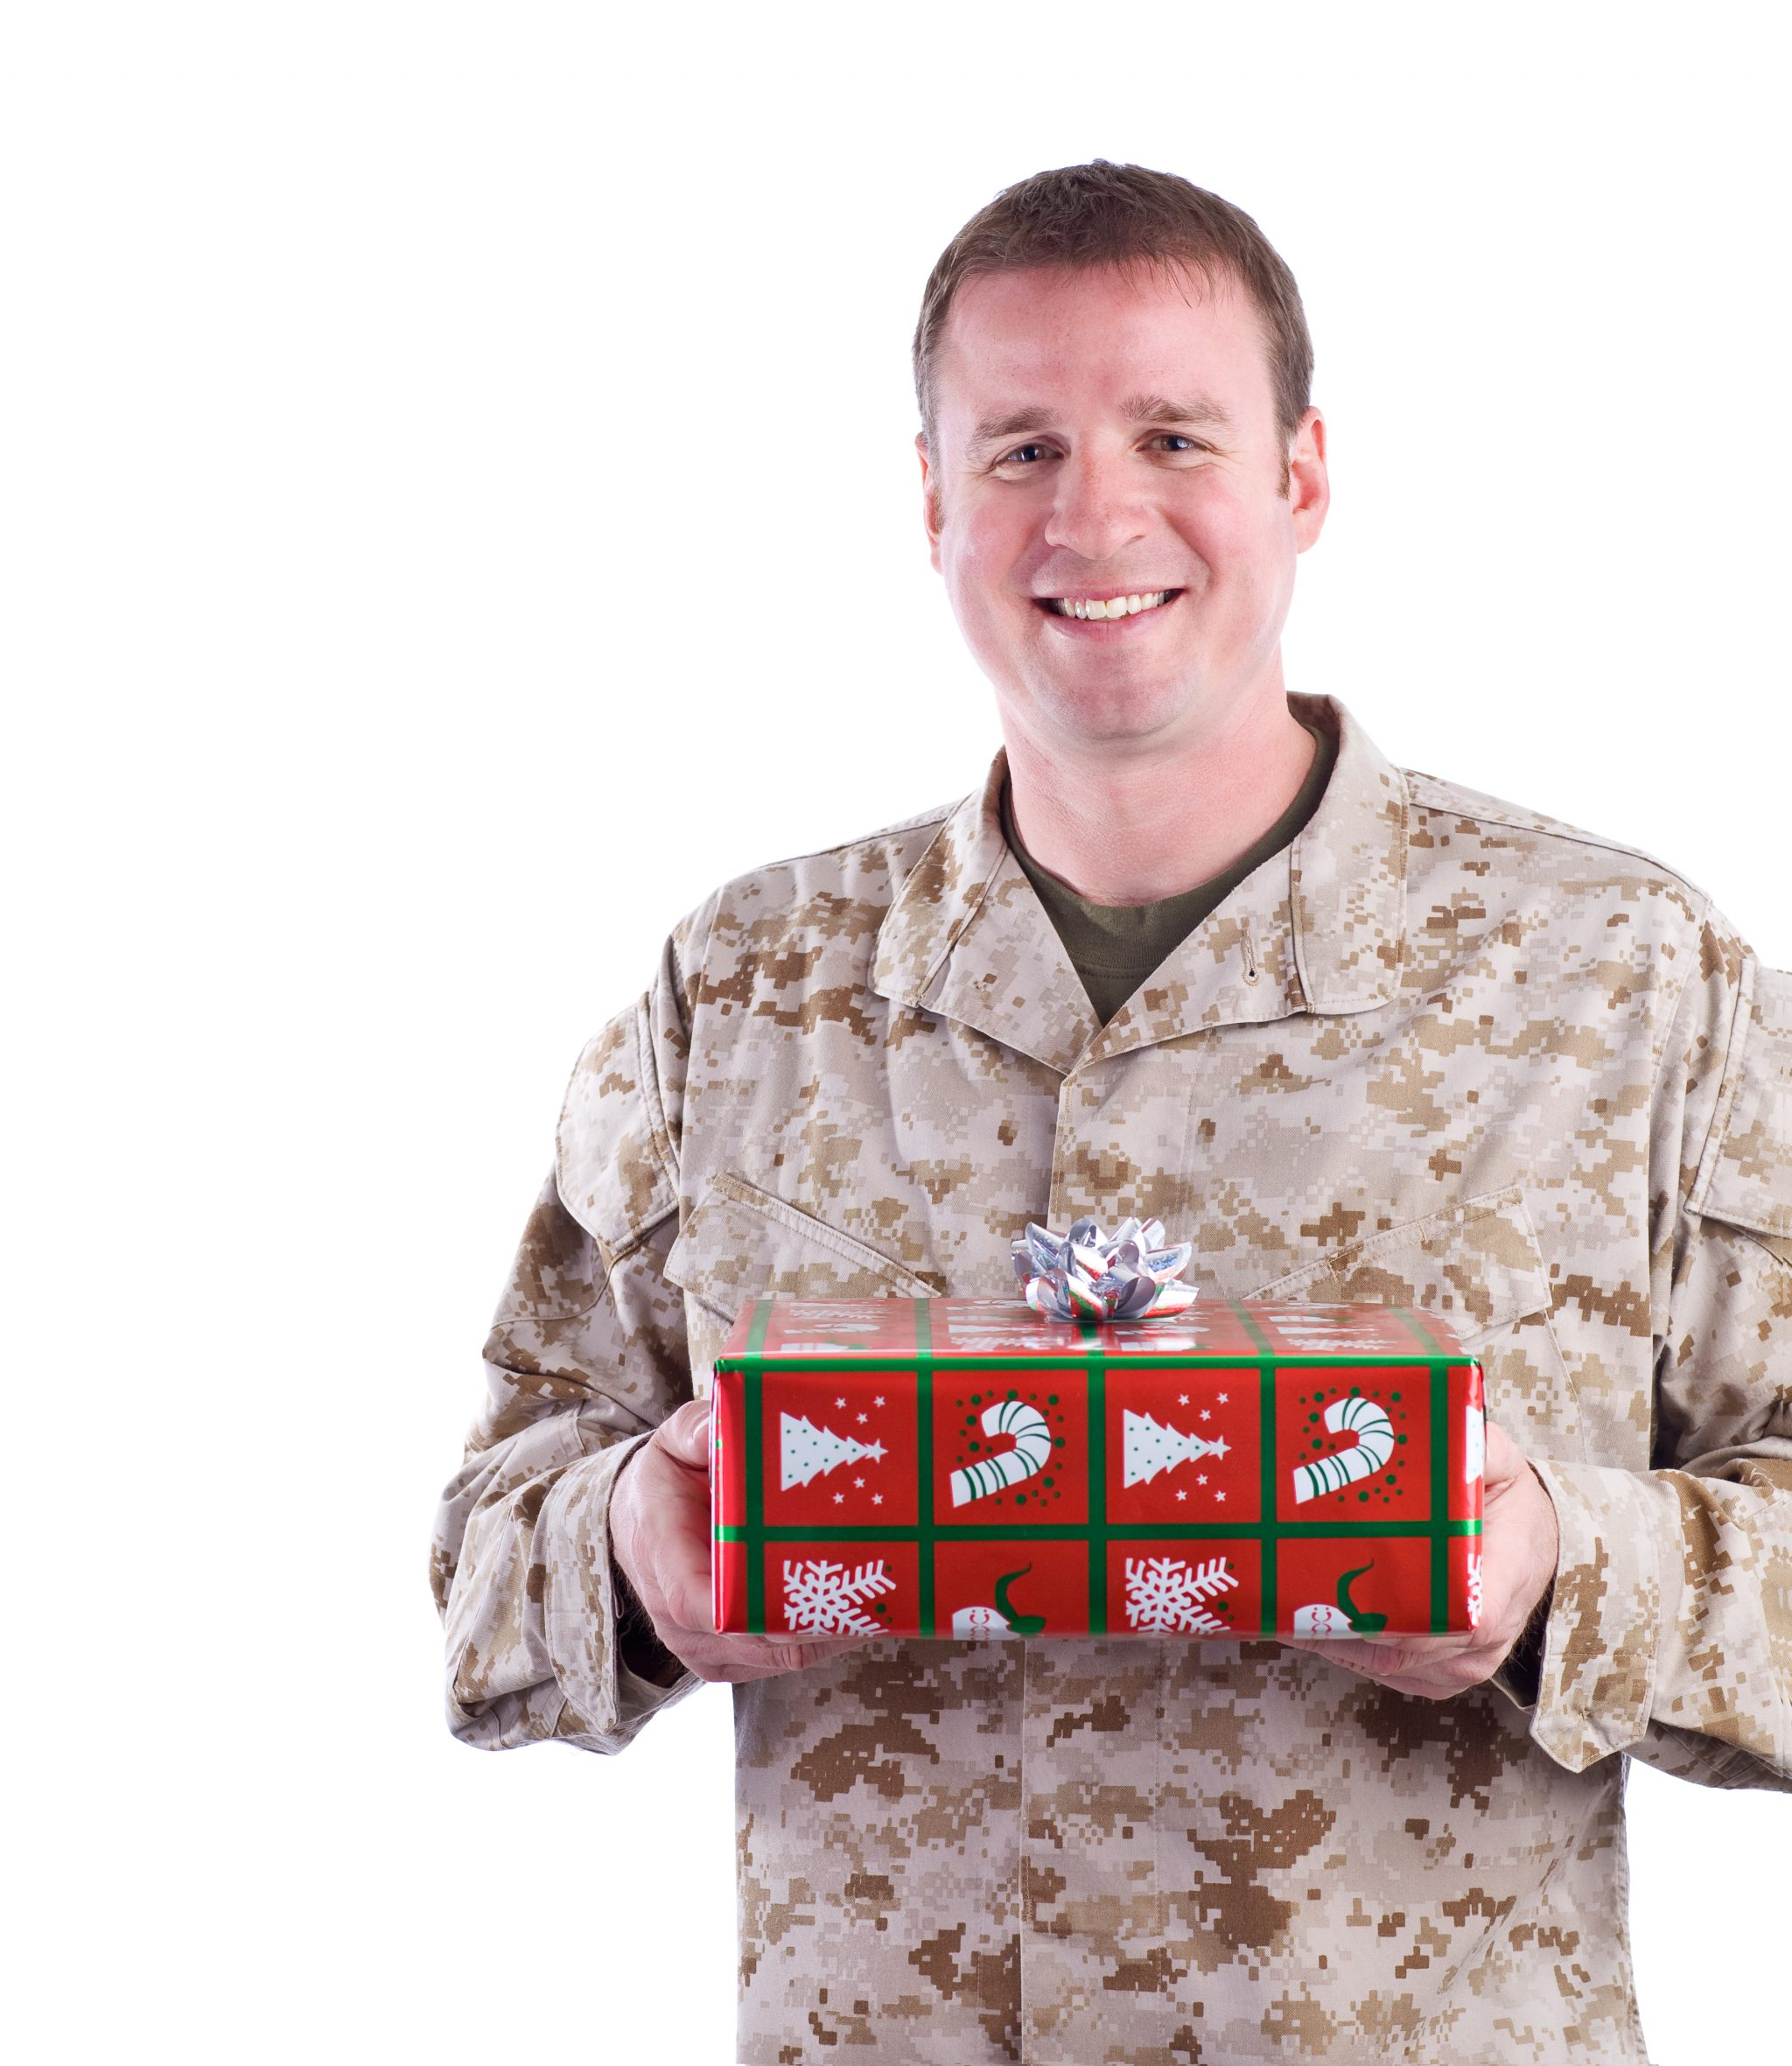 Marine Holds a Christmas Gift